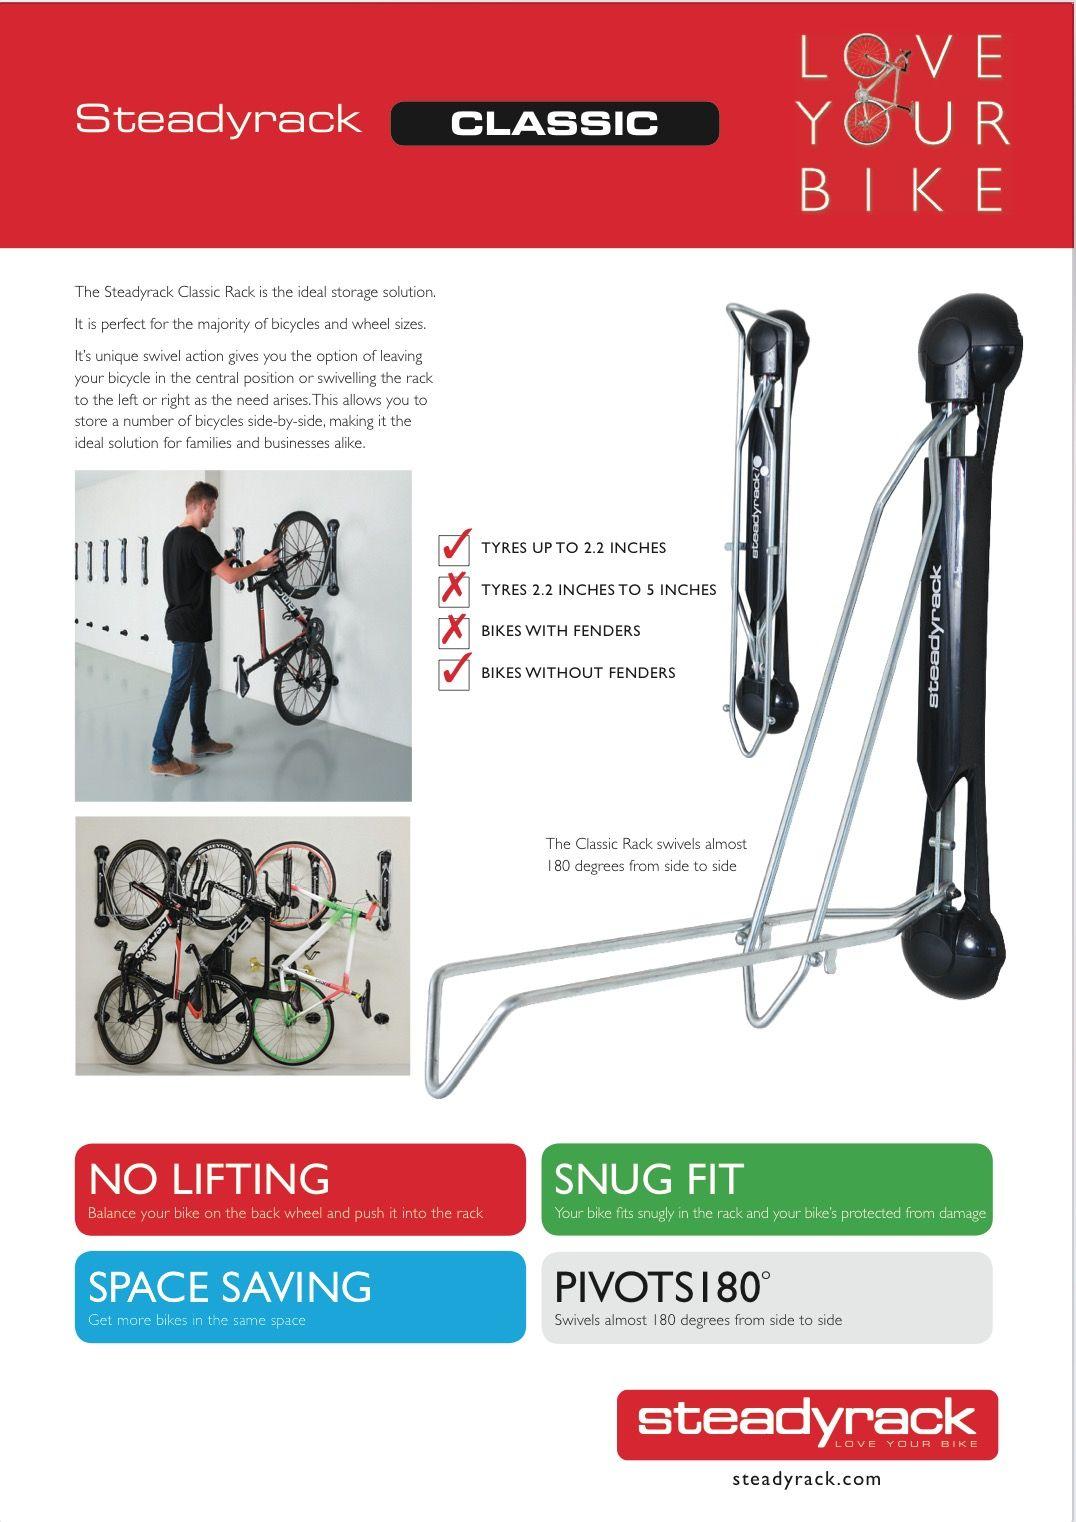 The Steadyrack Bike Parking Rack Is The Best Bike Storage Solution